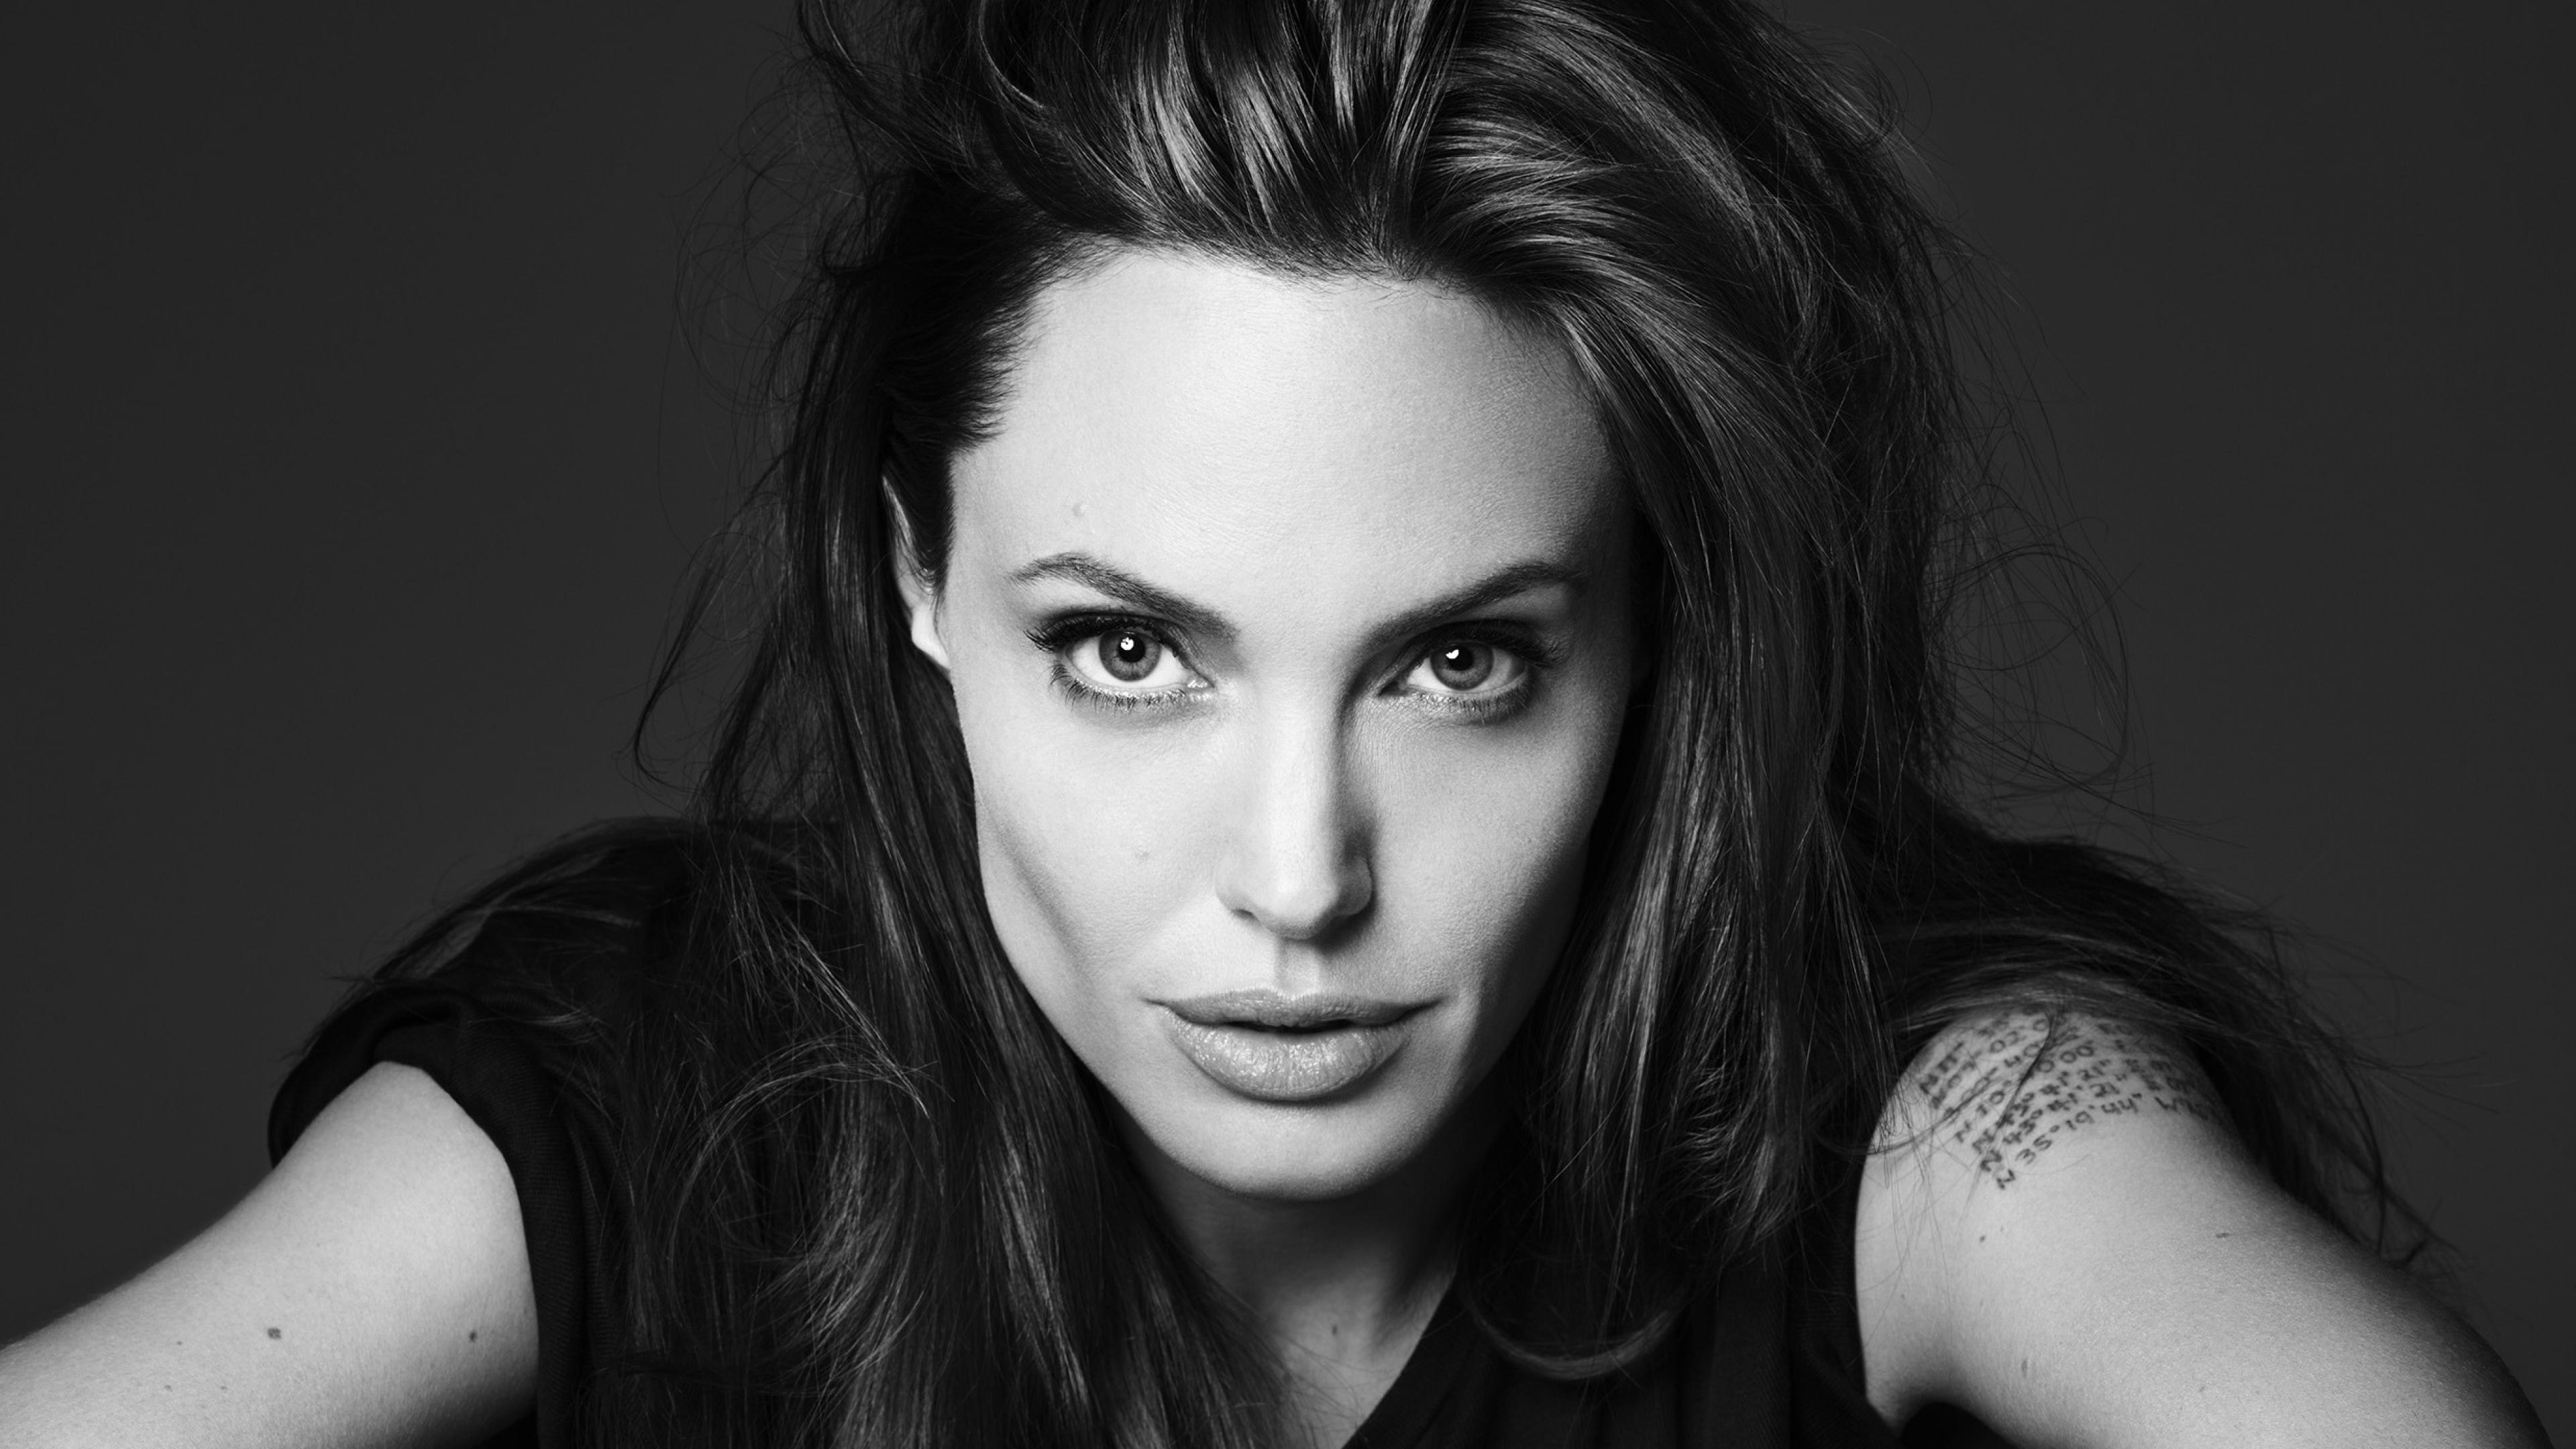 angelina jolie 1536855298 - Angelina Jolie - photoshoot wallpapers, celebrities wallpapers, angelina jolie wallpapers